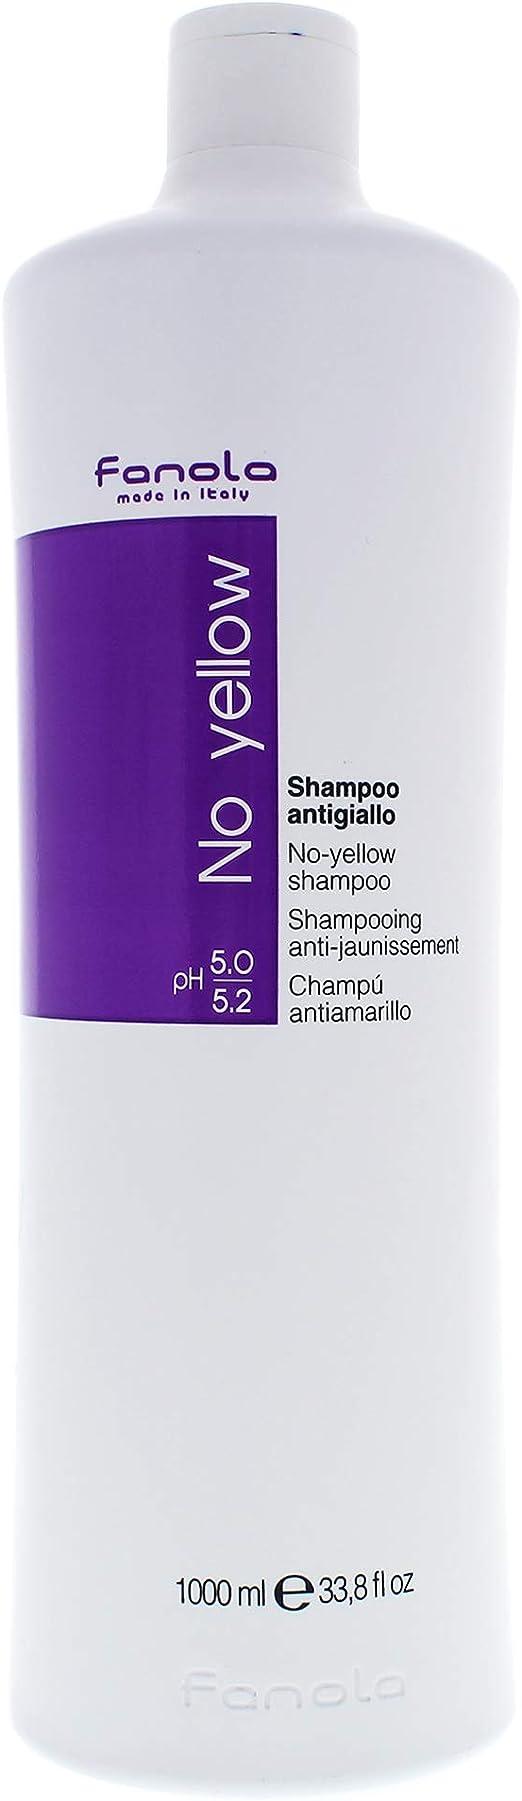 Fanola, Champú No Yellow, 1000 ml.